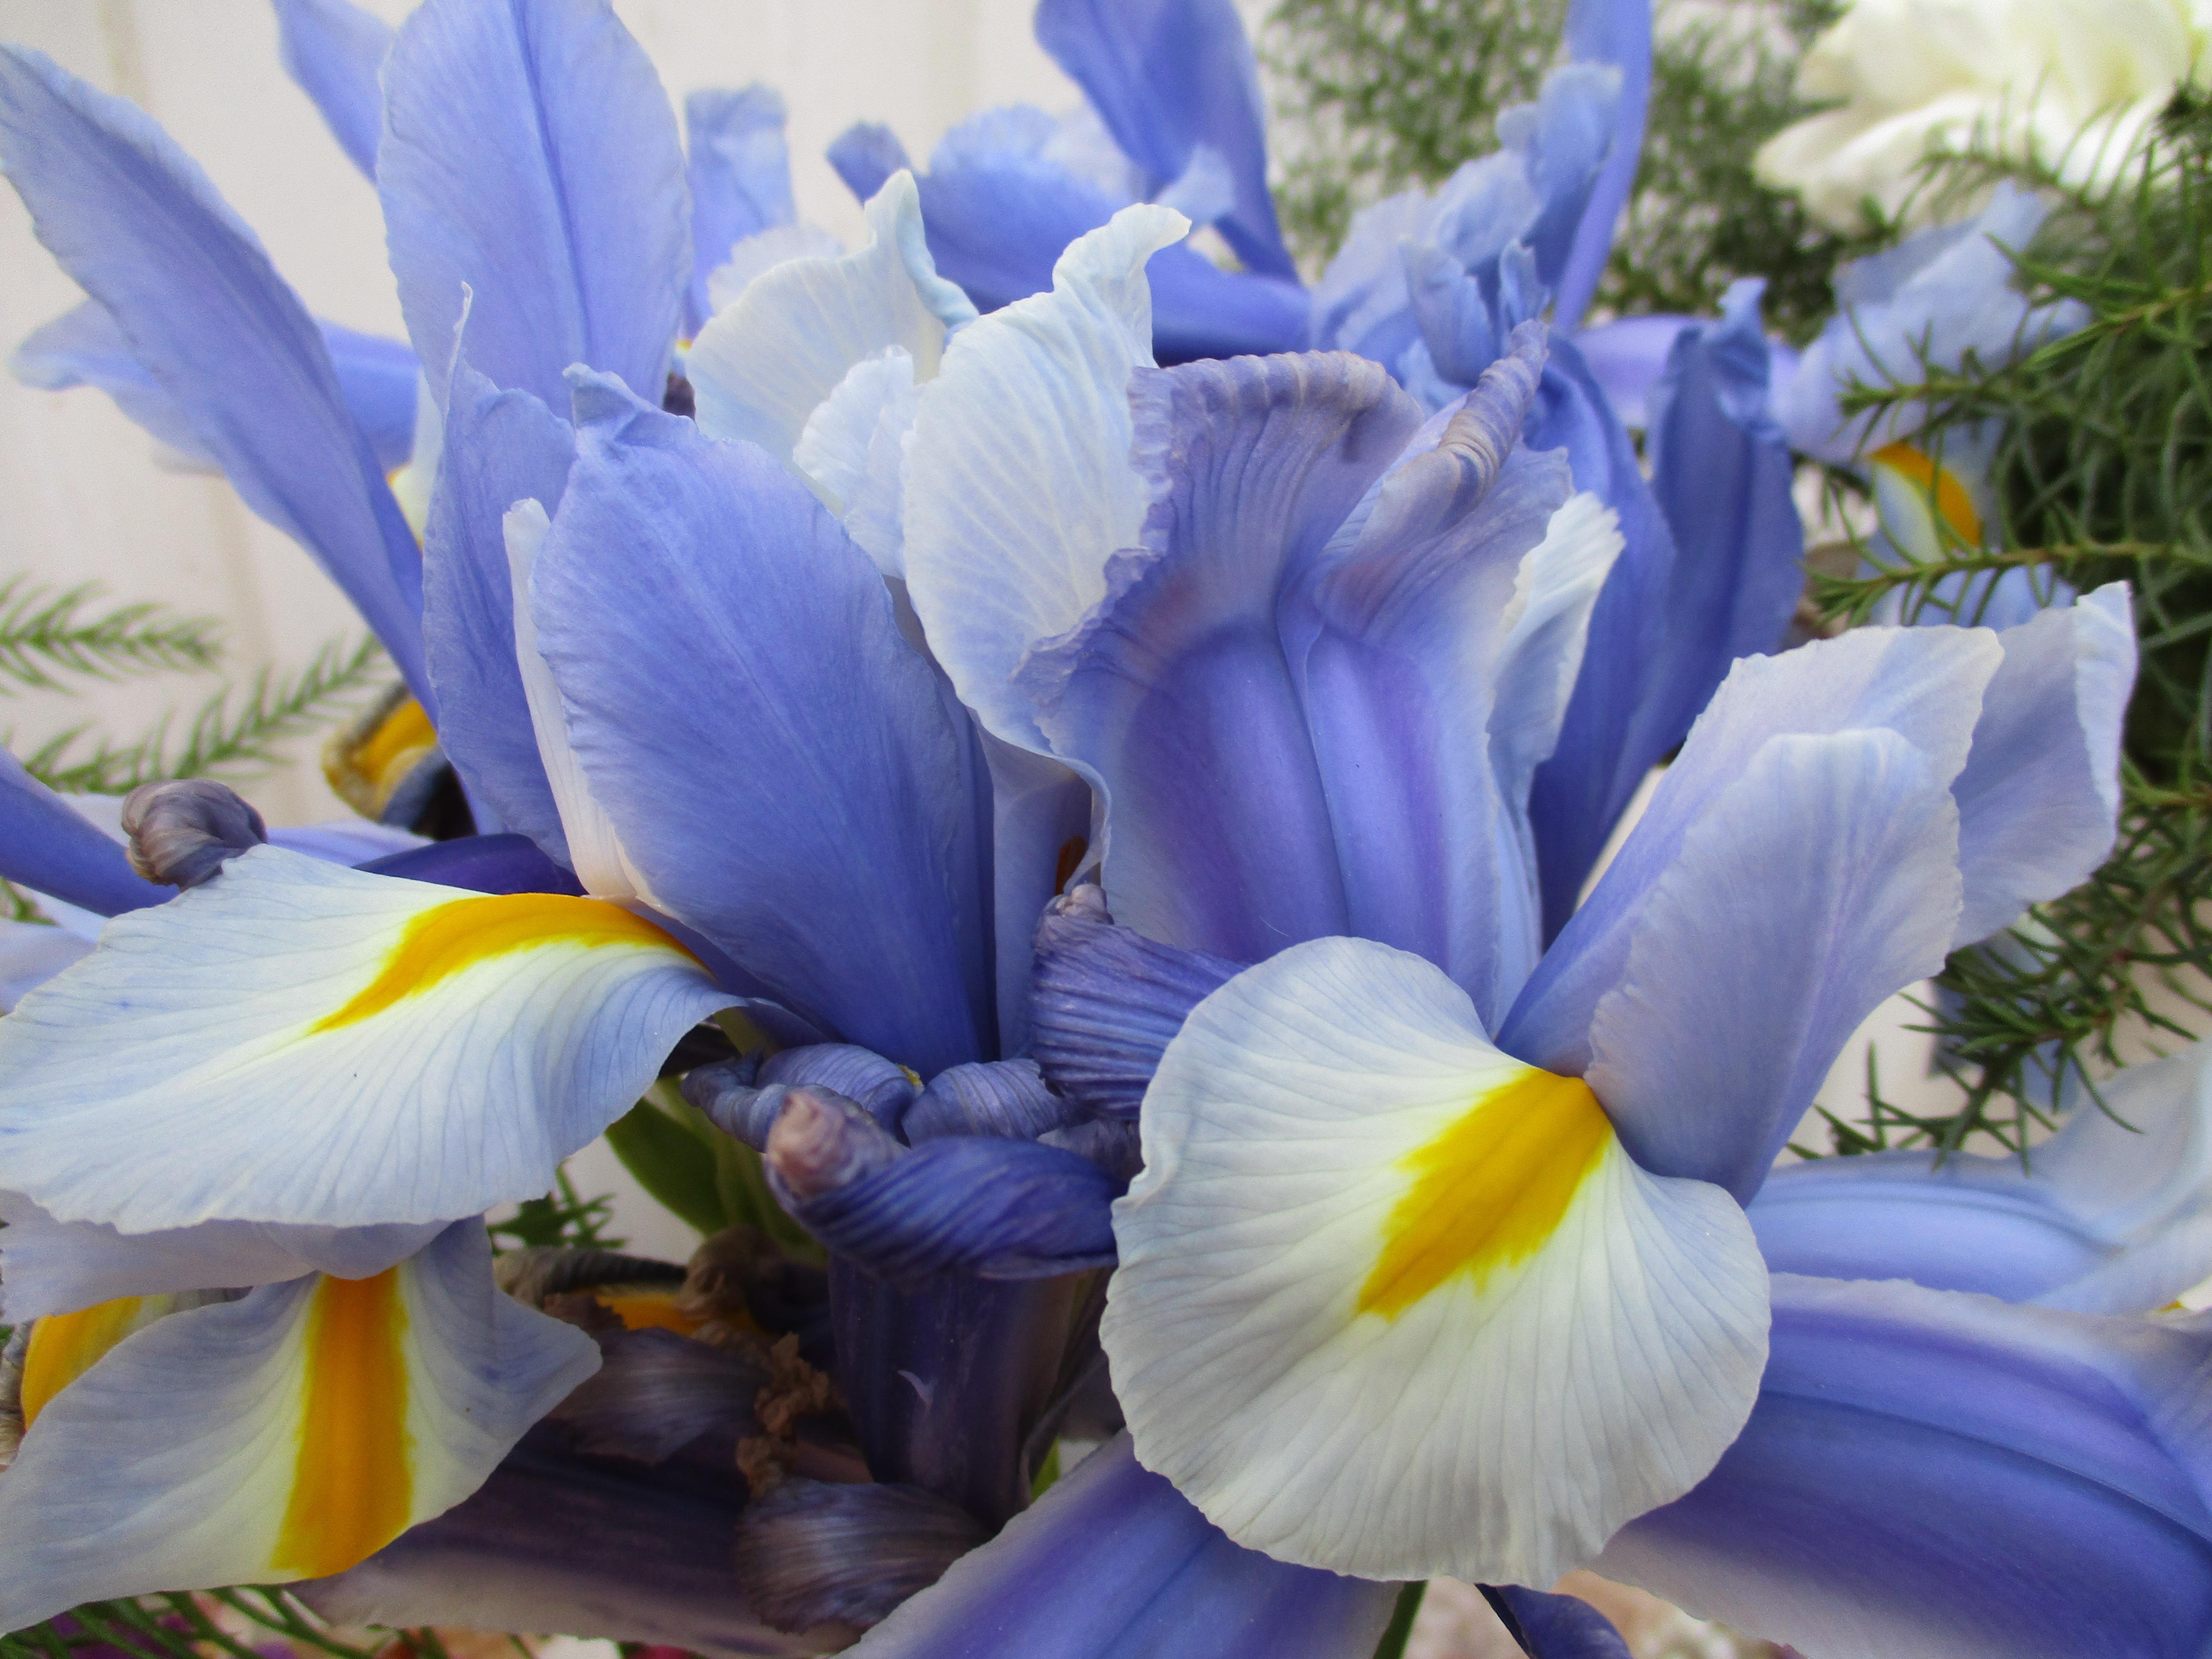 Free Images : nature, flower, petal, bloom, summer, bouquet, spring ...